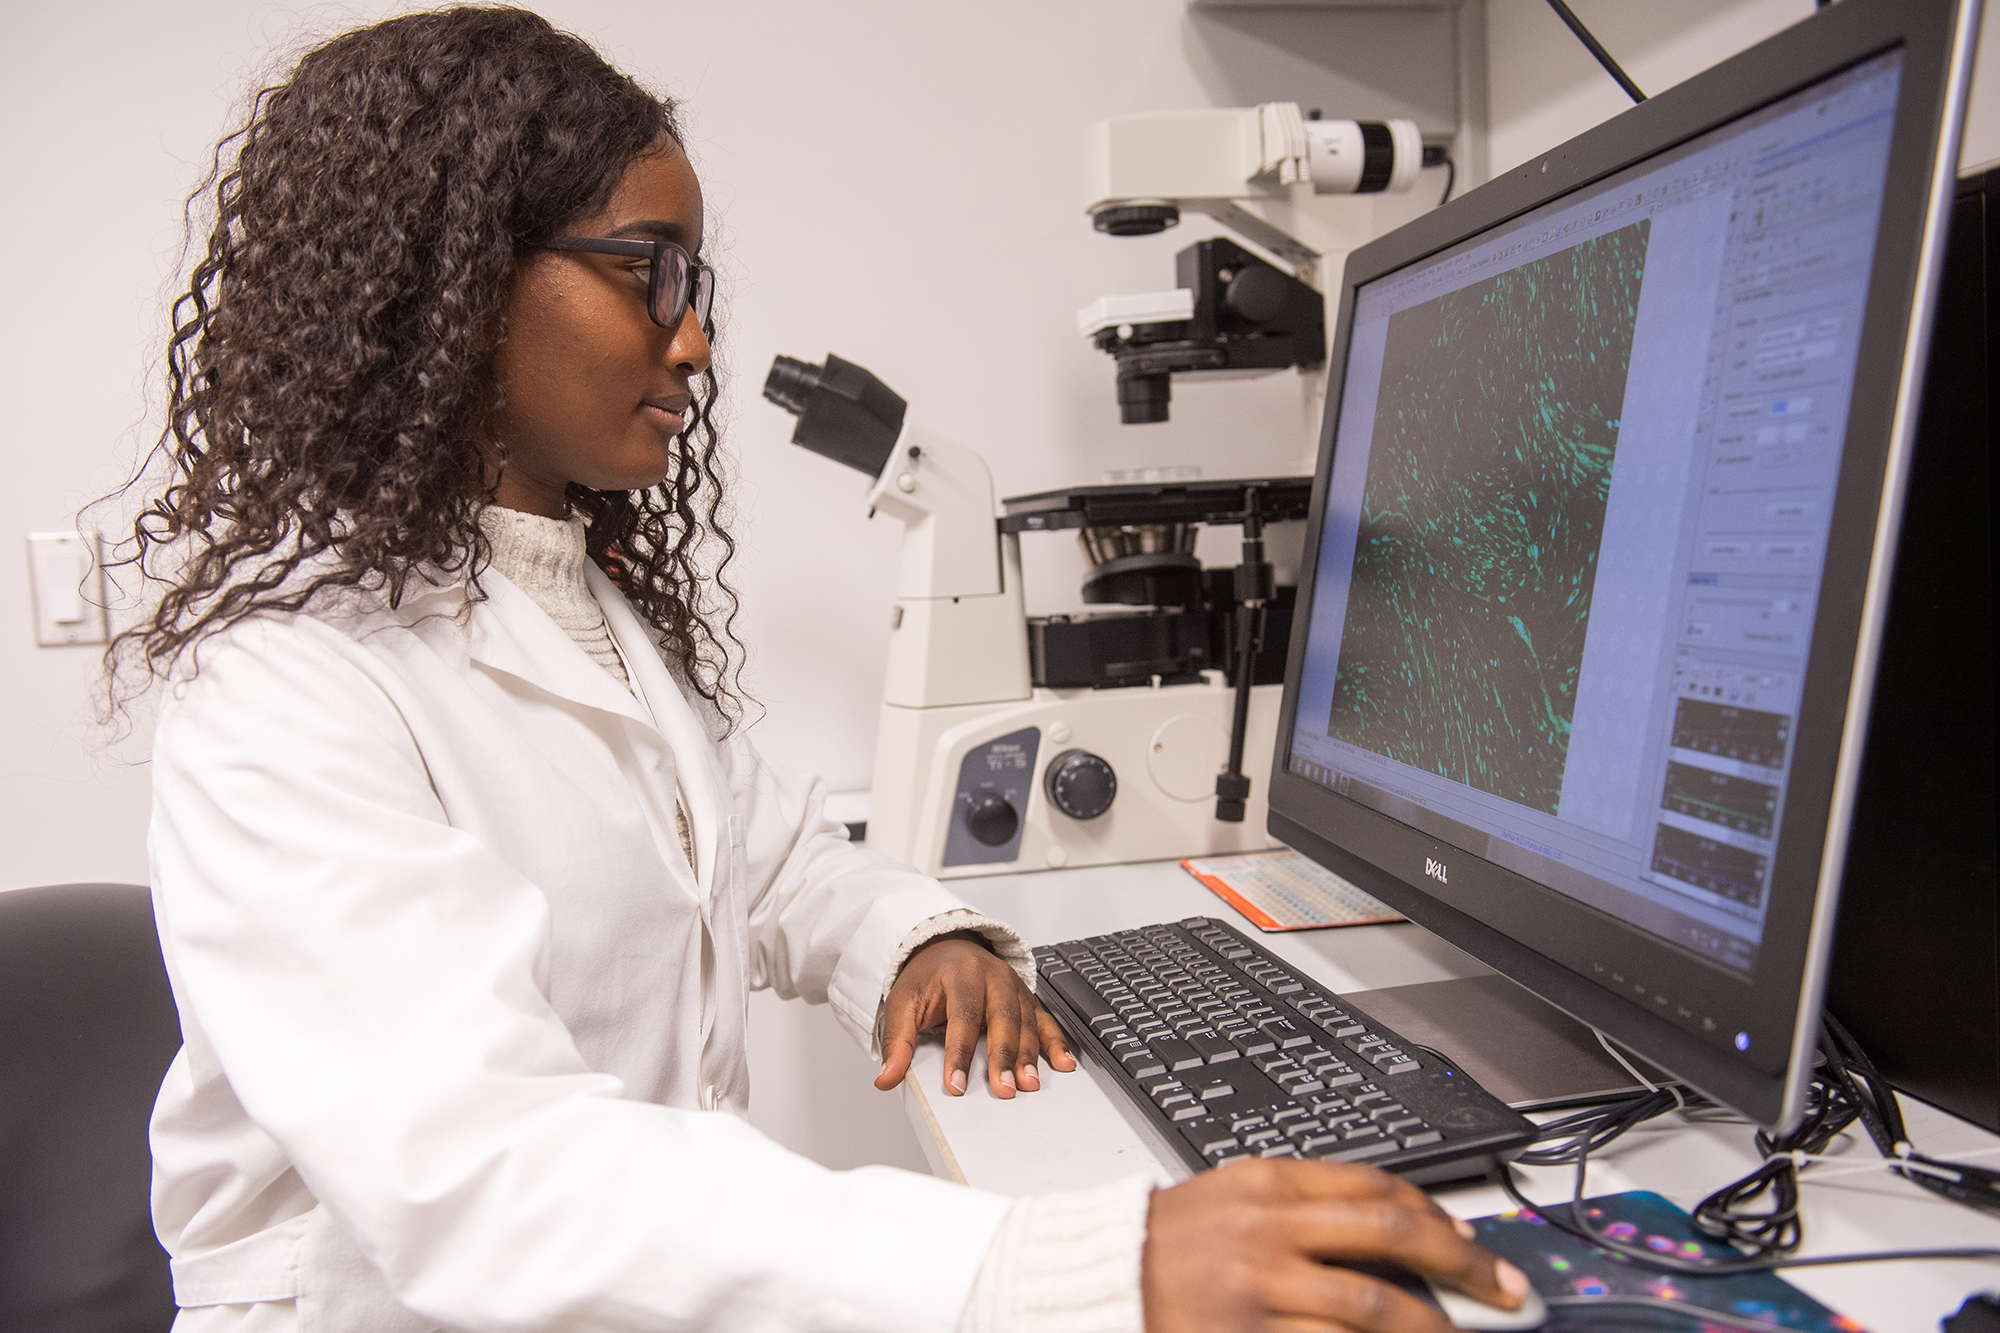 University of Iowa undergraduate researcher Margaret Mungai